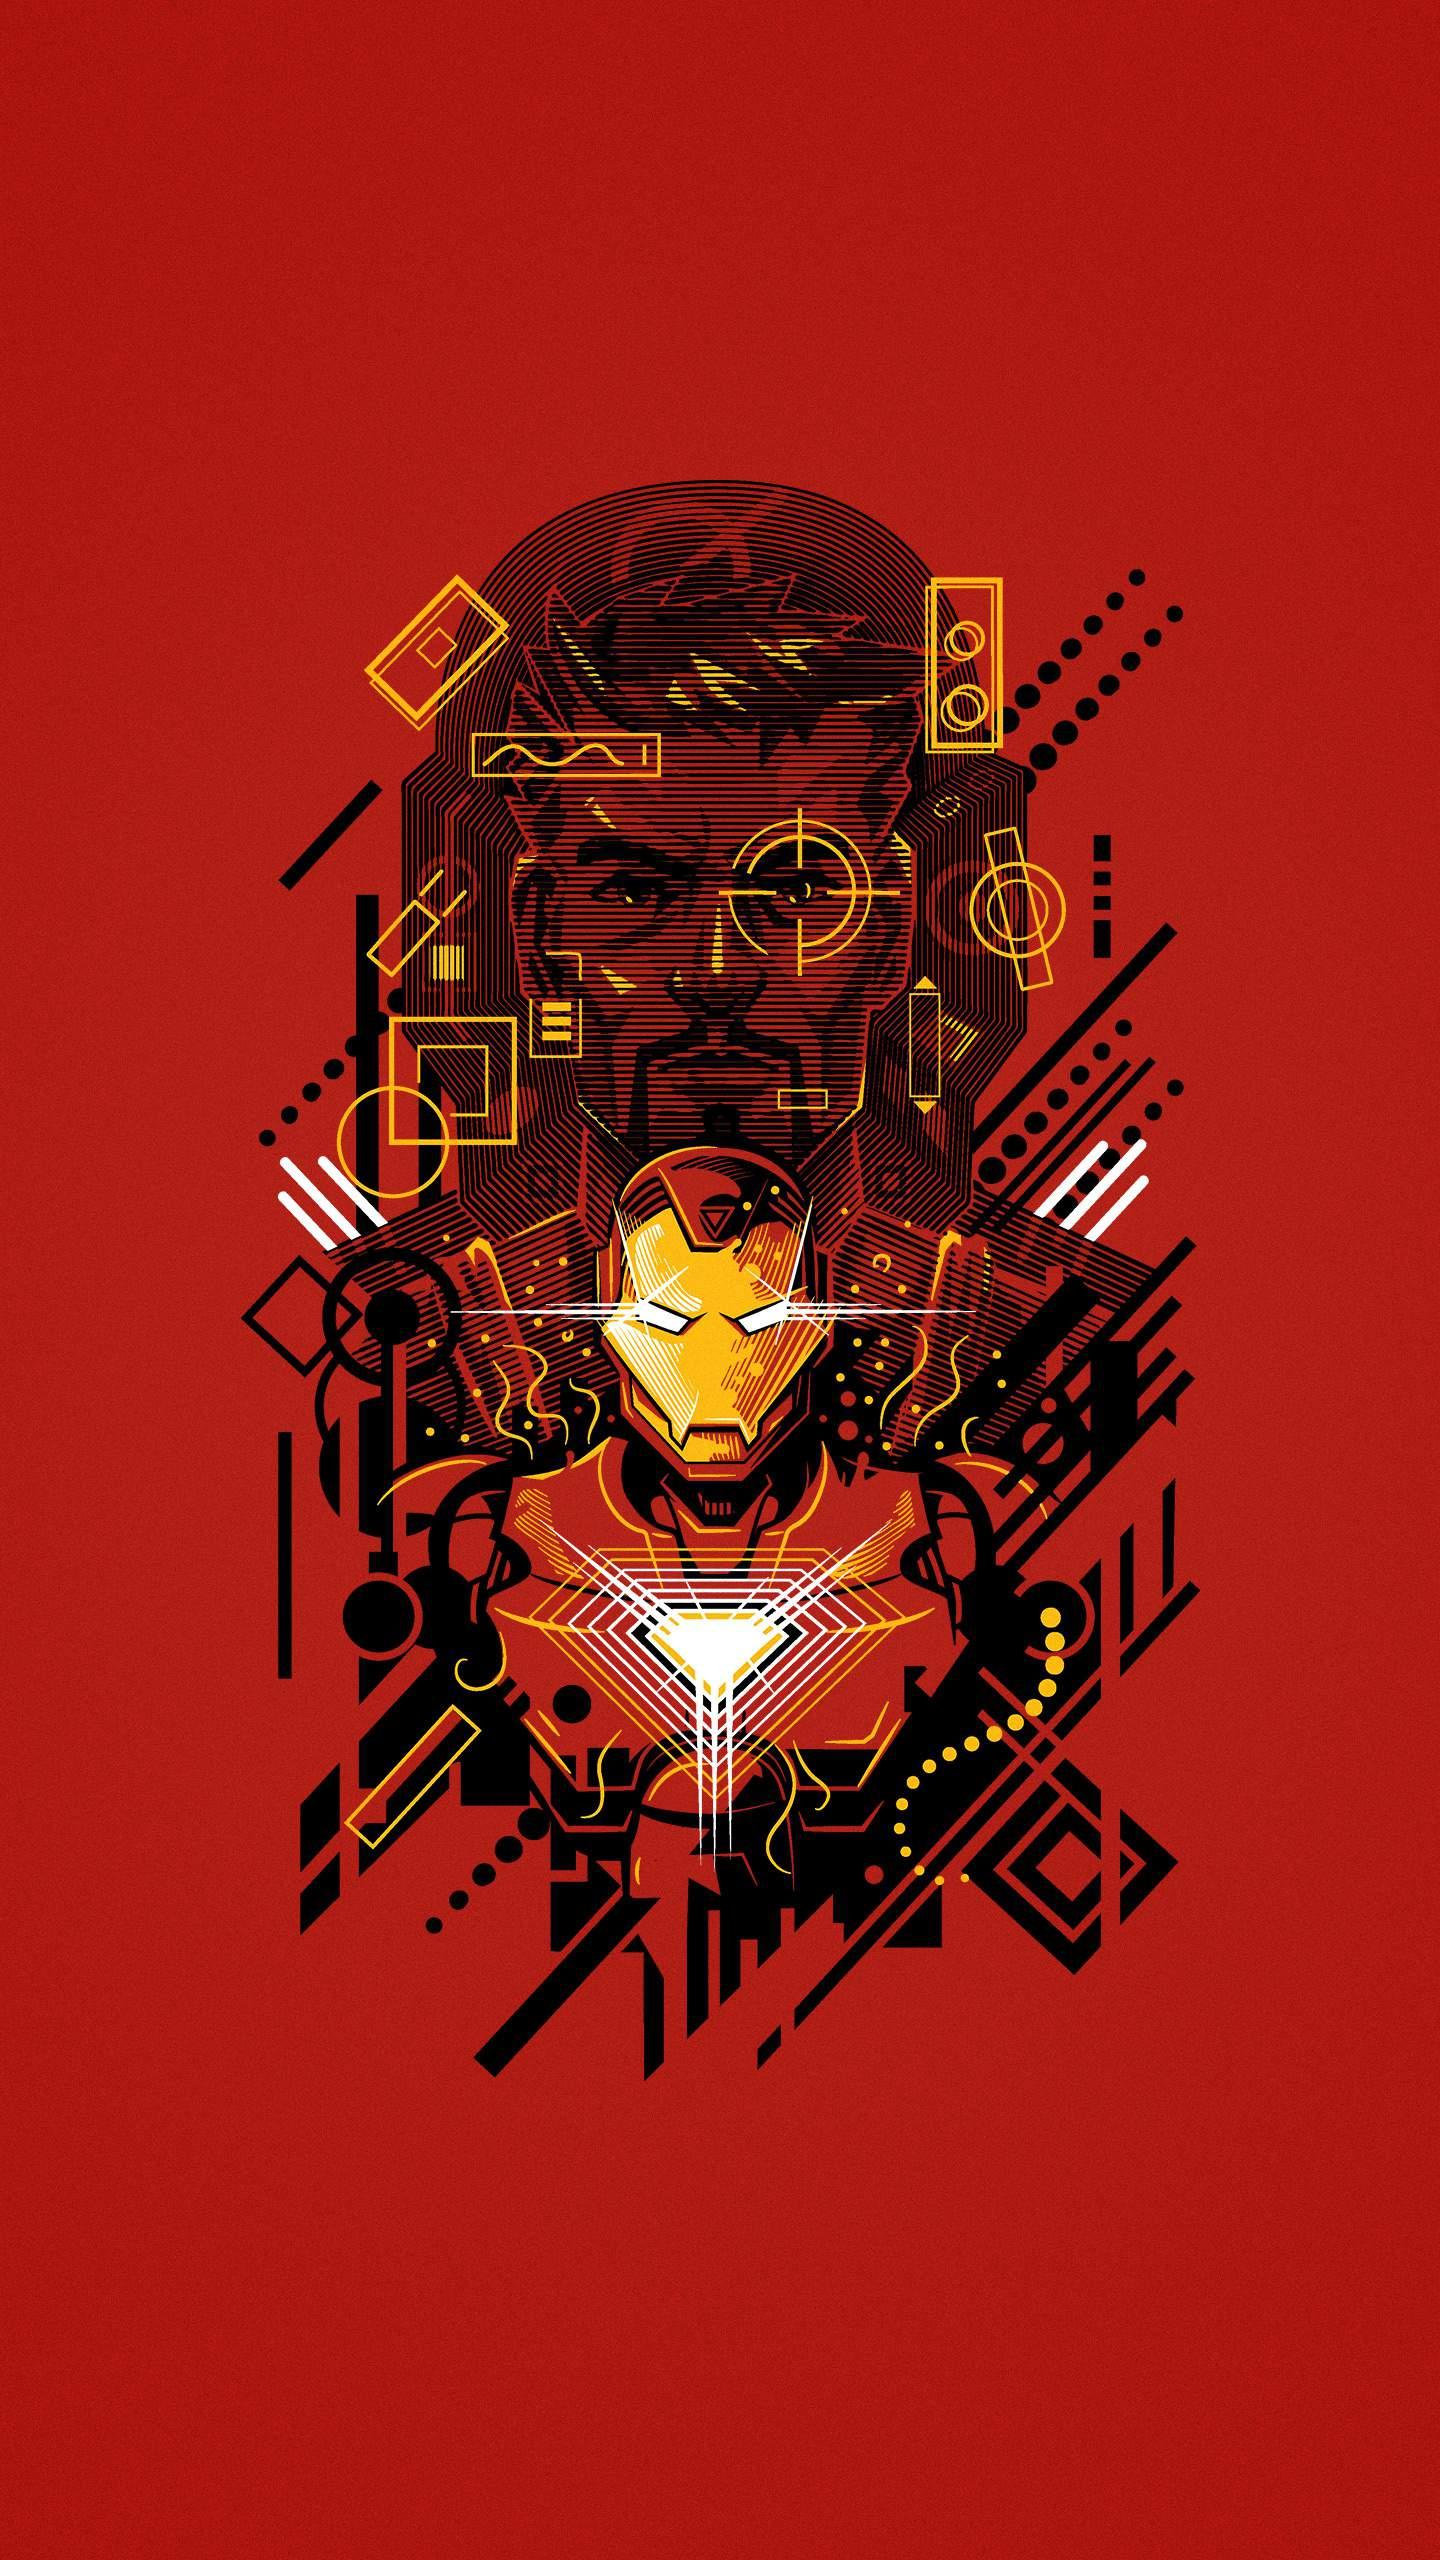 Cute Love Quotes Wallpaper Hd Iron Man Tony Stark Iphone Wallpaper Iphone Wallpapers